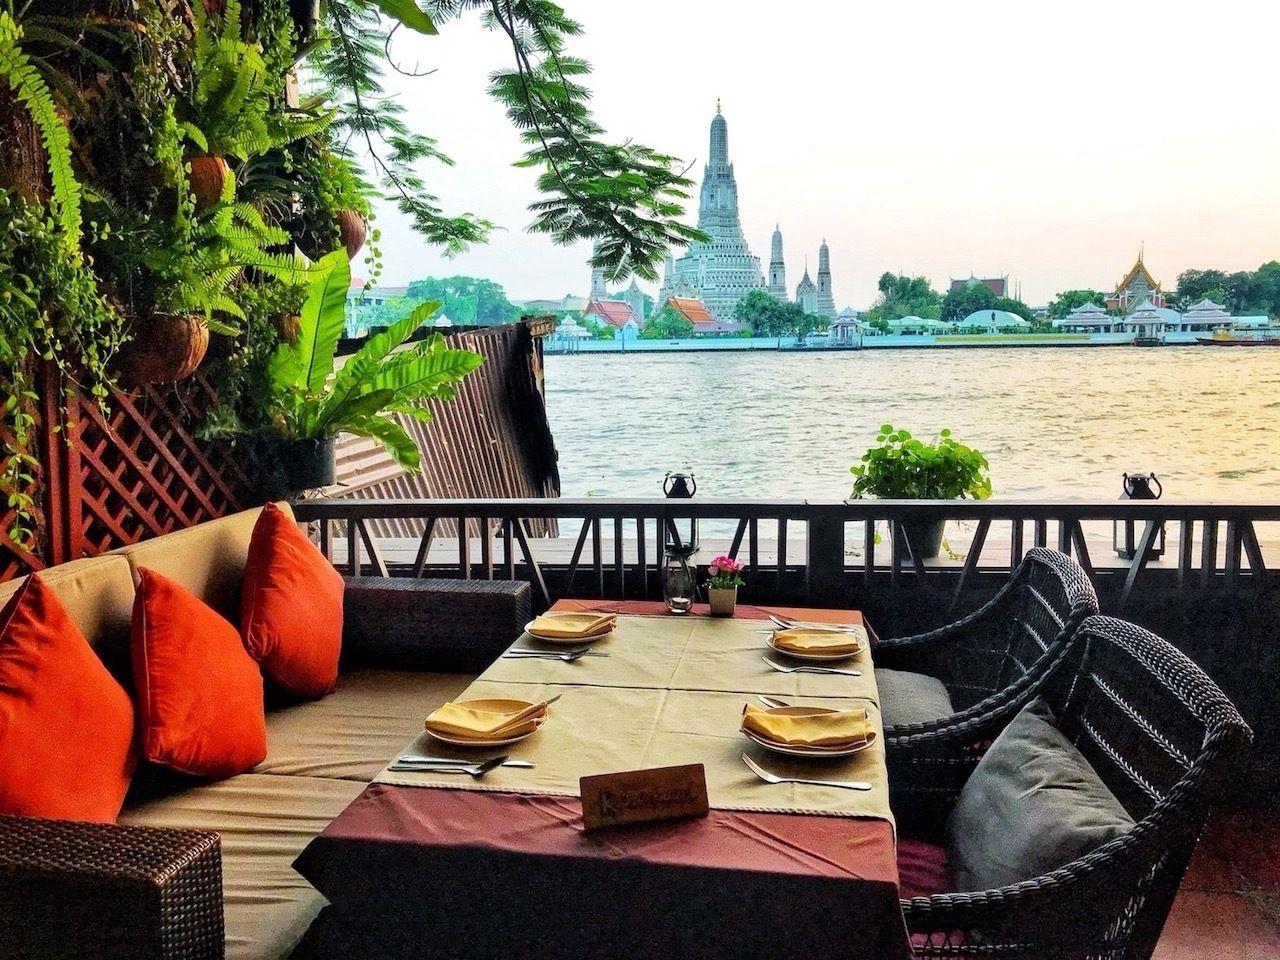 One-day-in-Bangkok-Eagles-Nest-restaurant-Wat-Arun